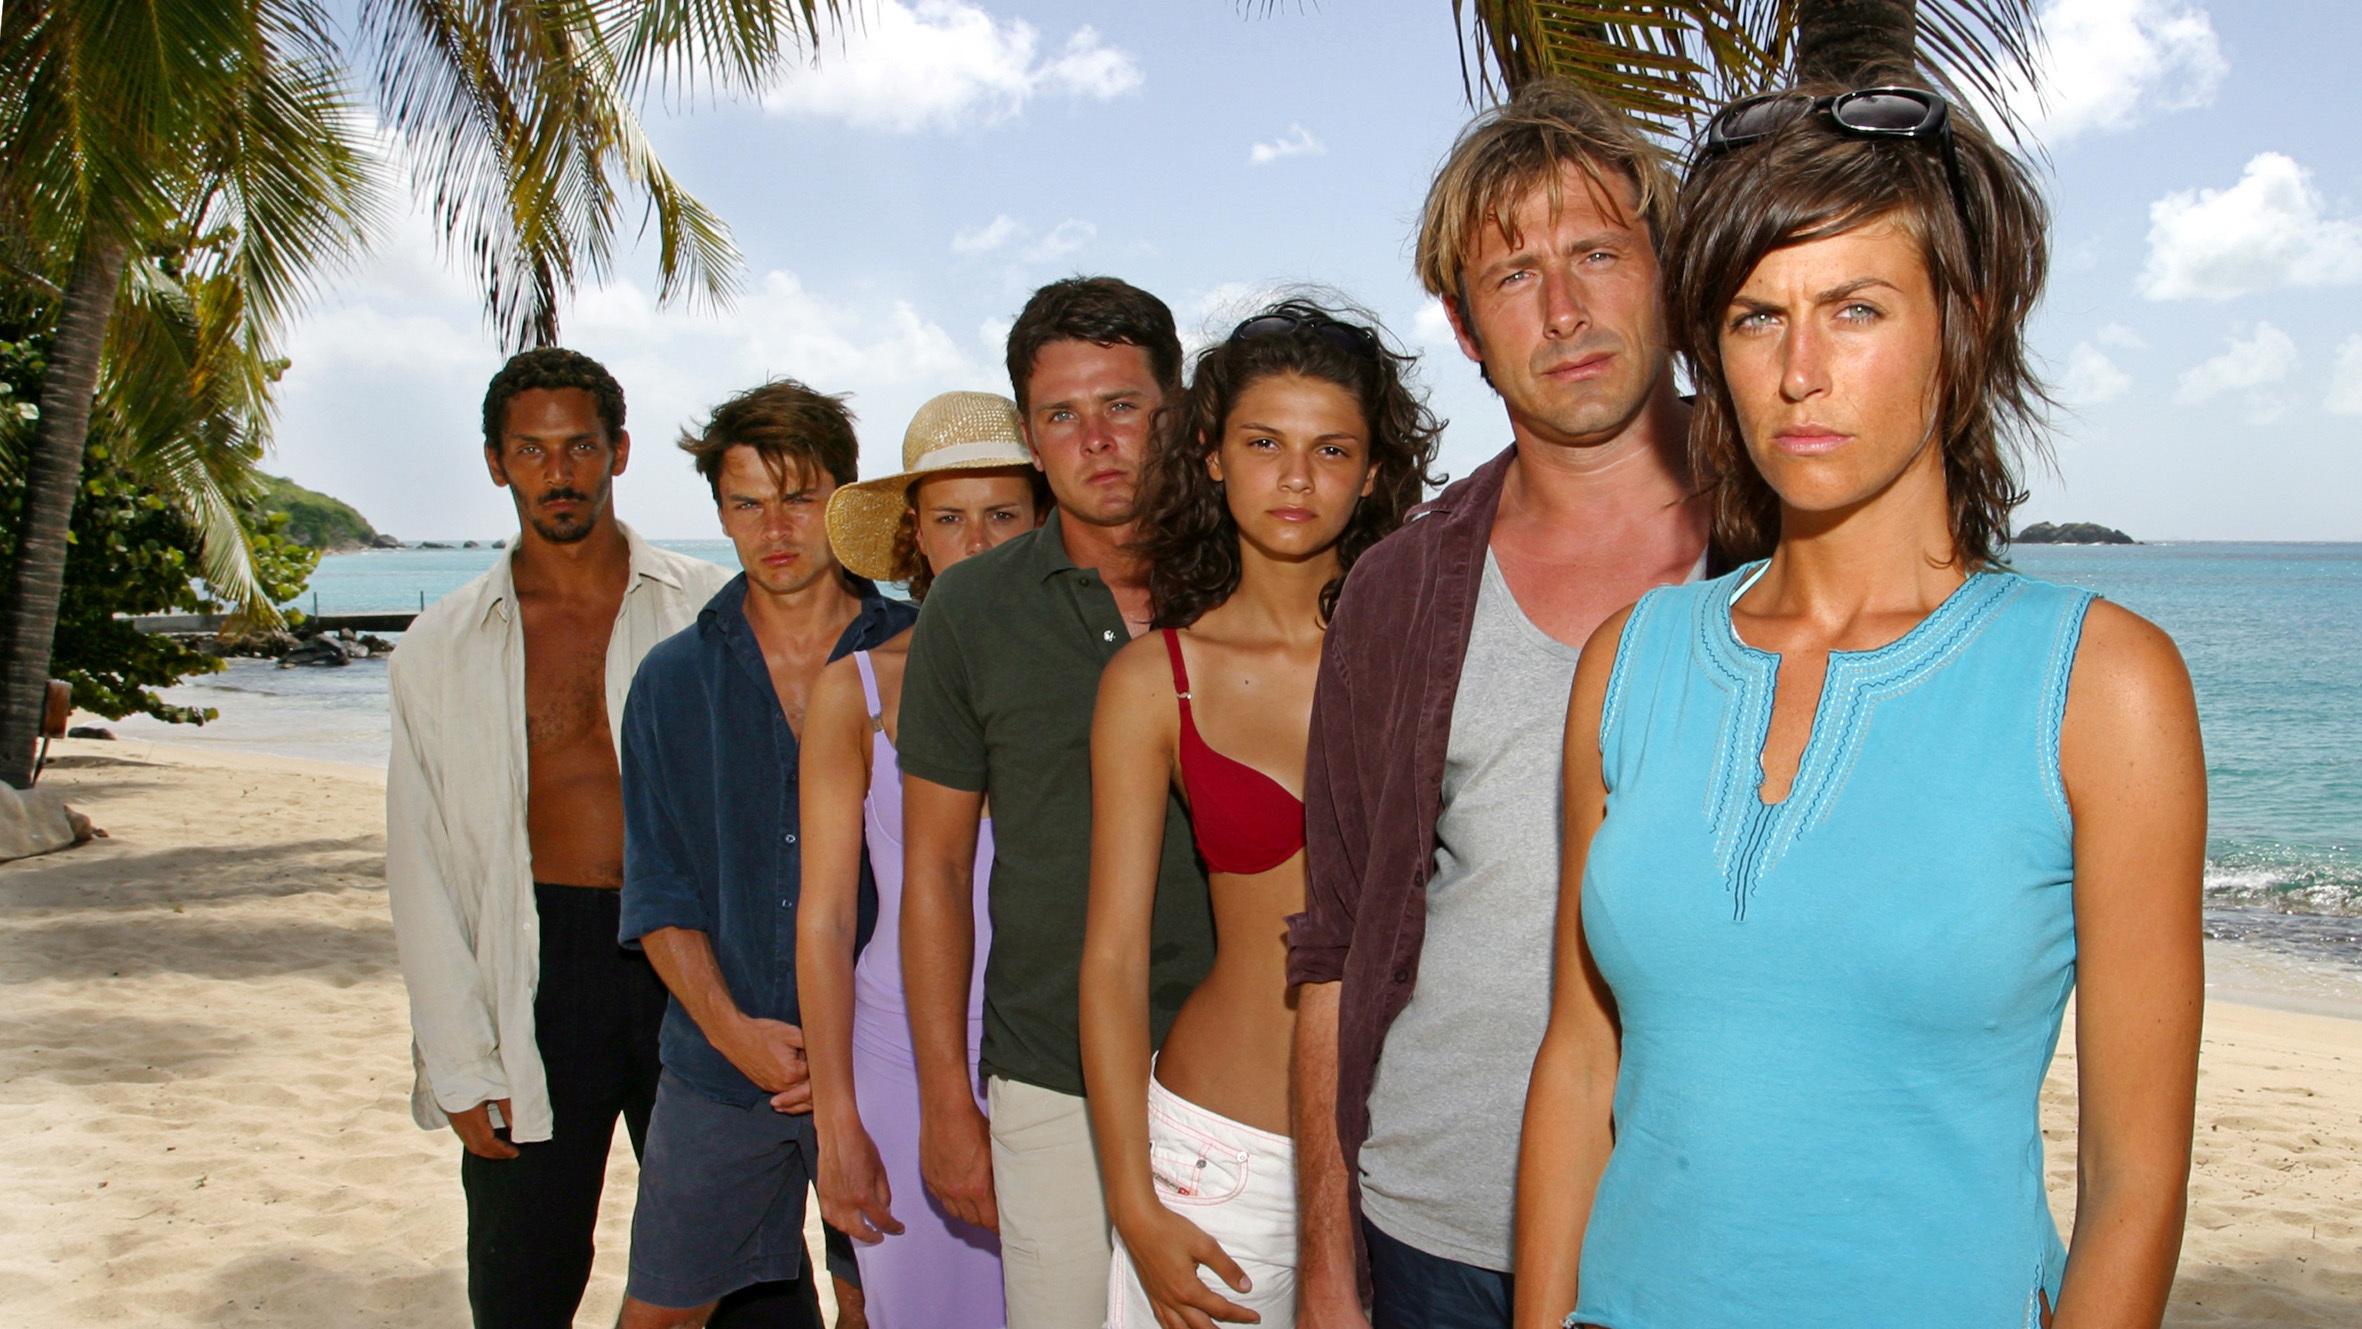 dangerous island full movie - HD2362×1329